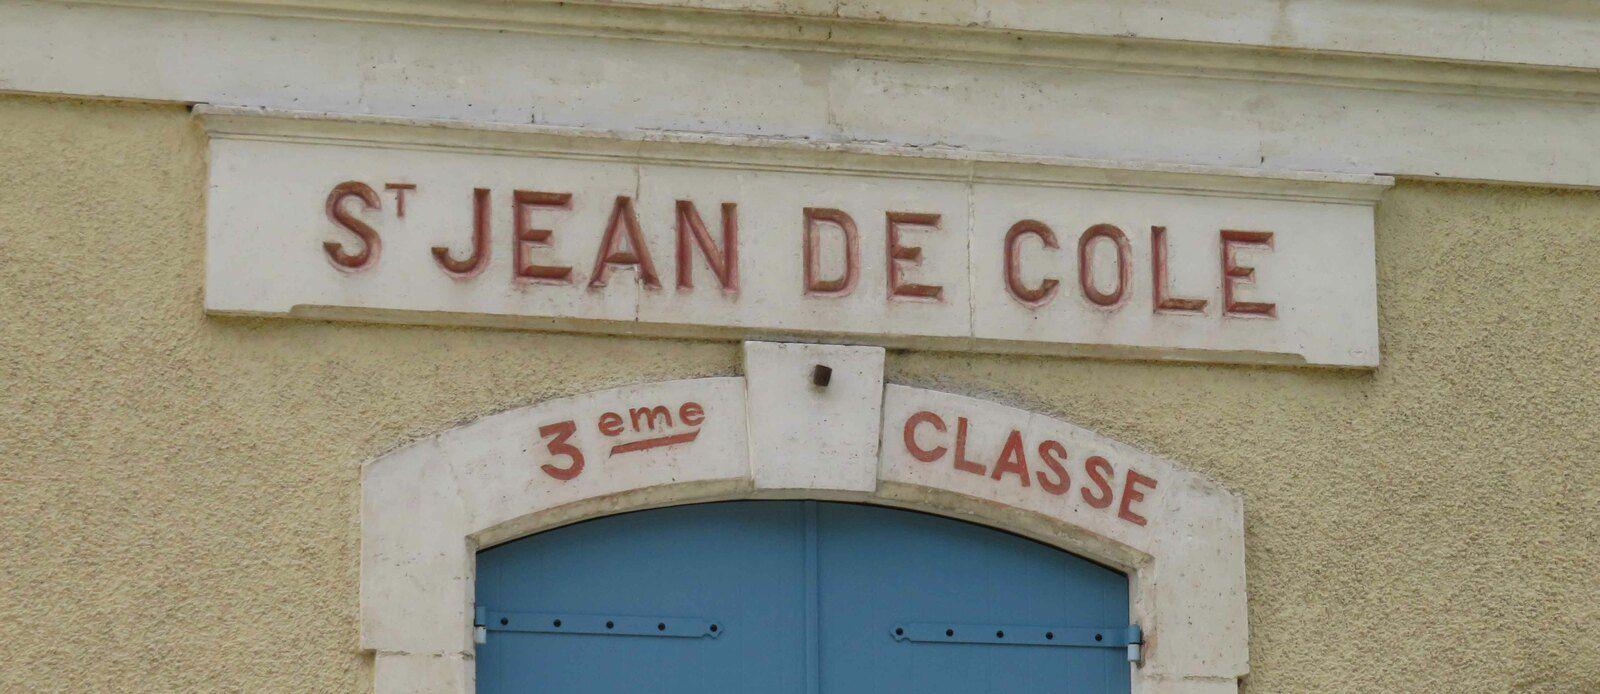 La gare de Saint Jean de Côle